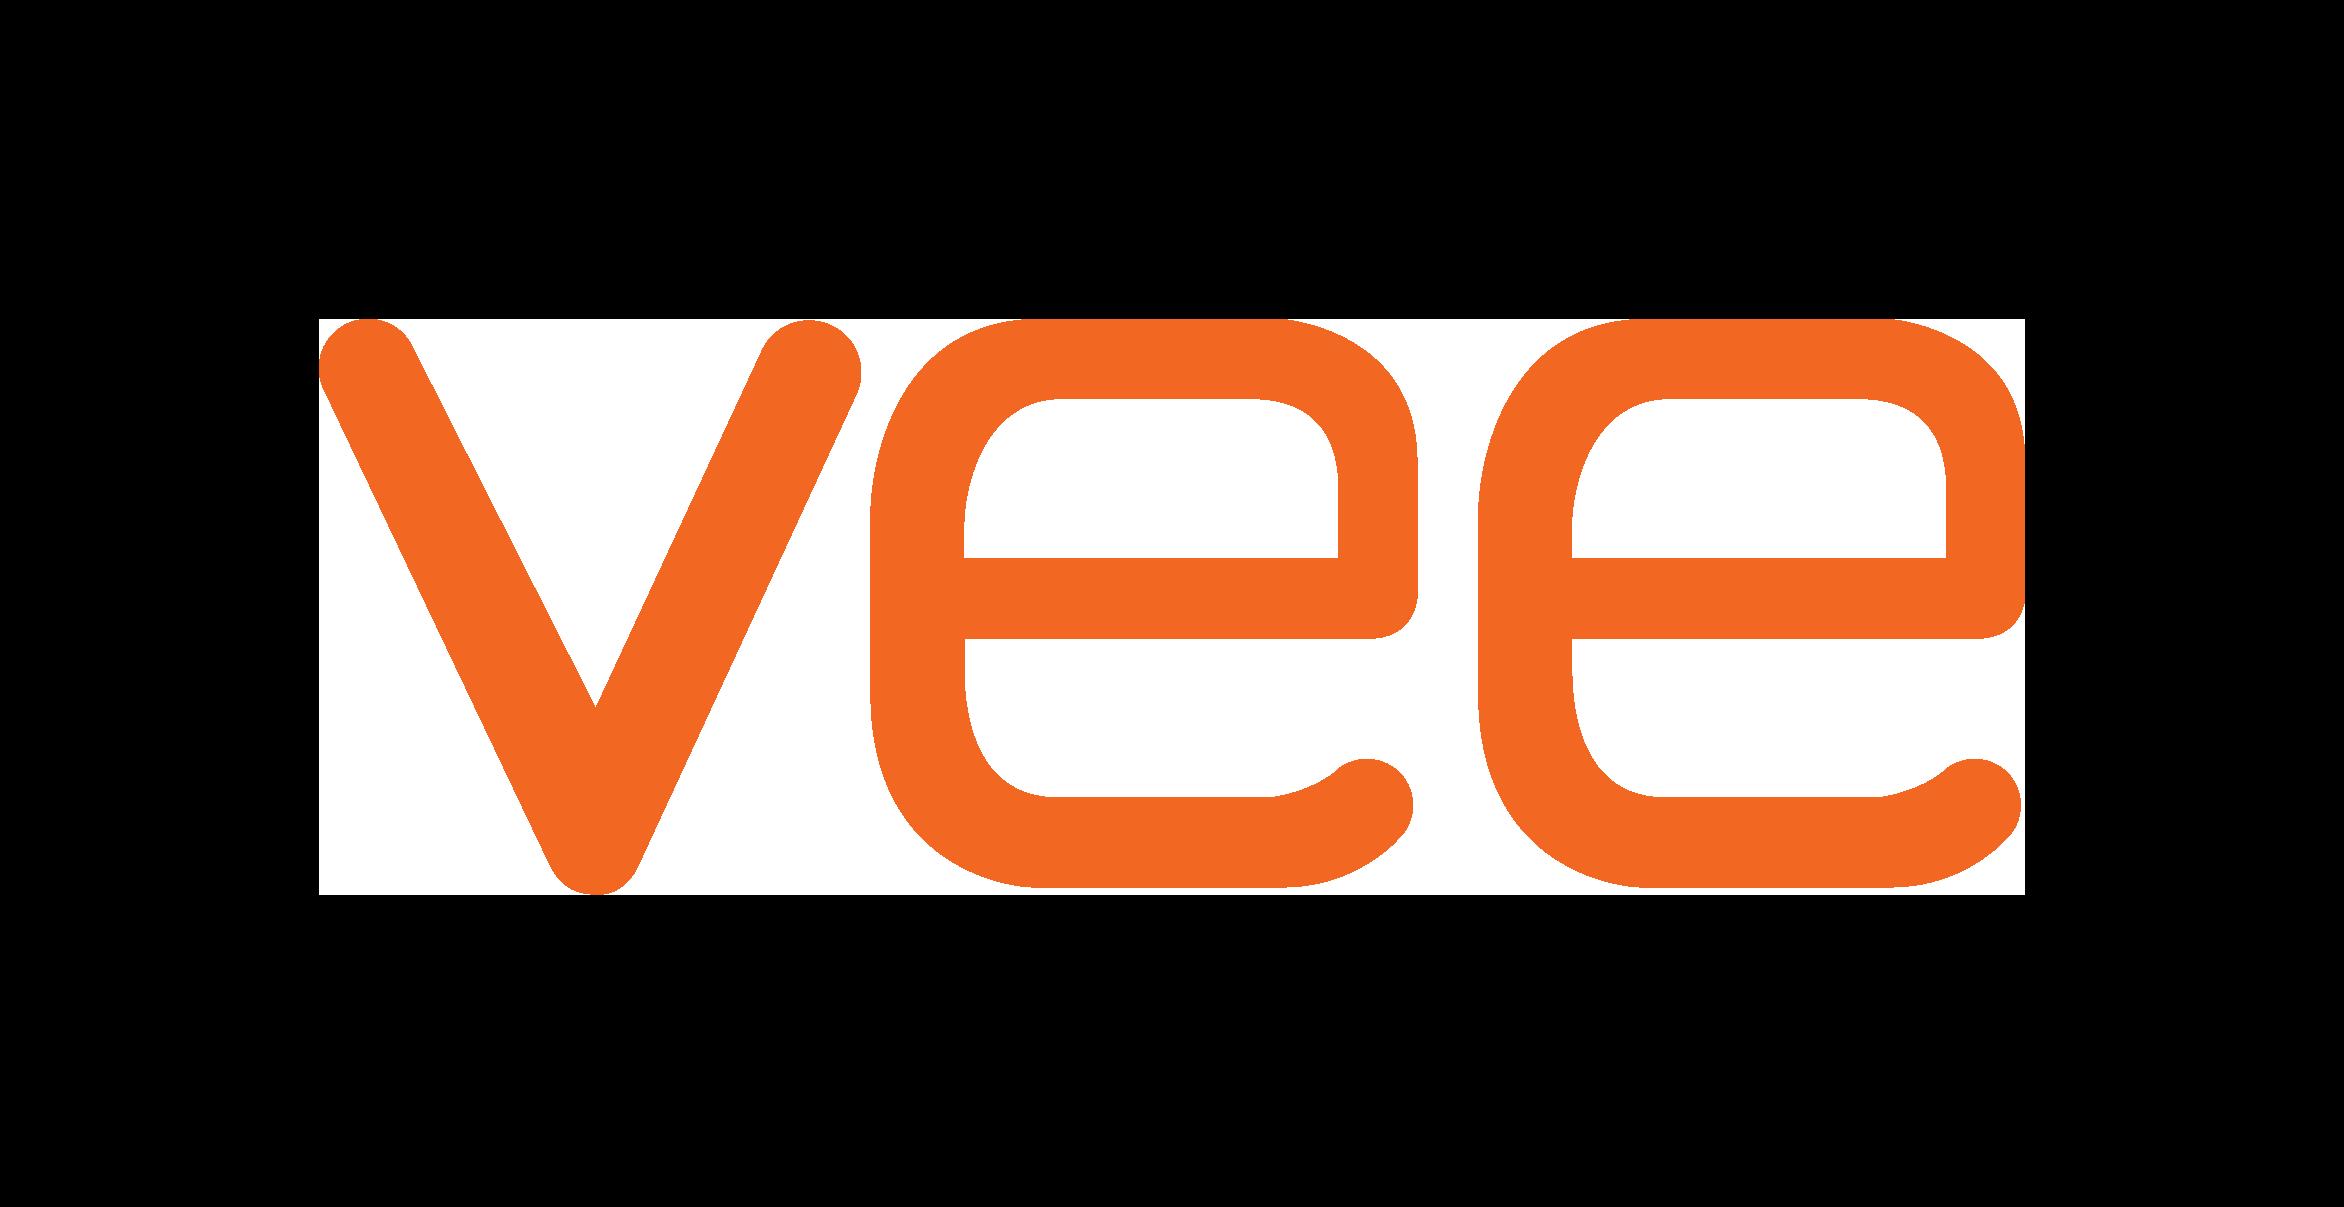 Vee-logo_cmyk_orange.png